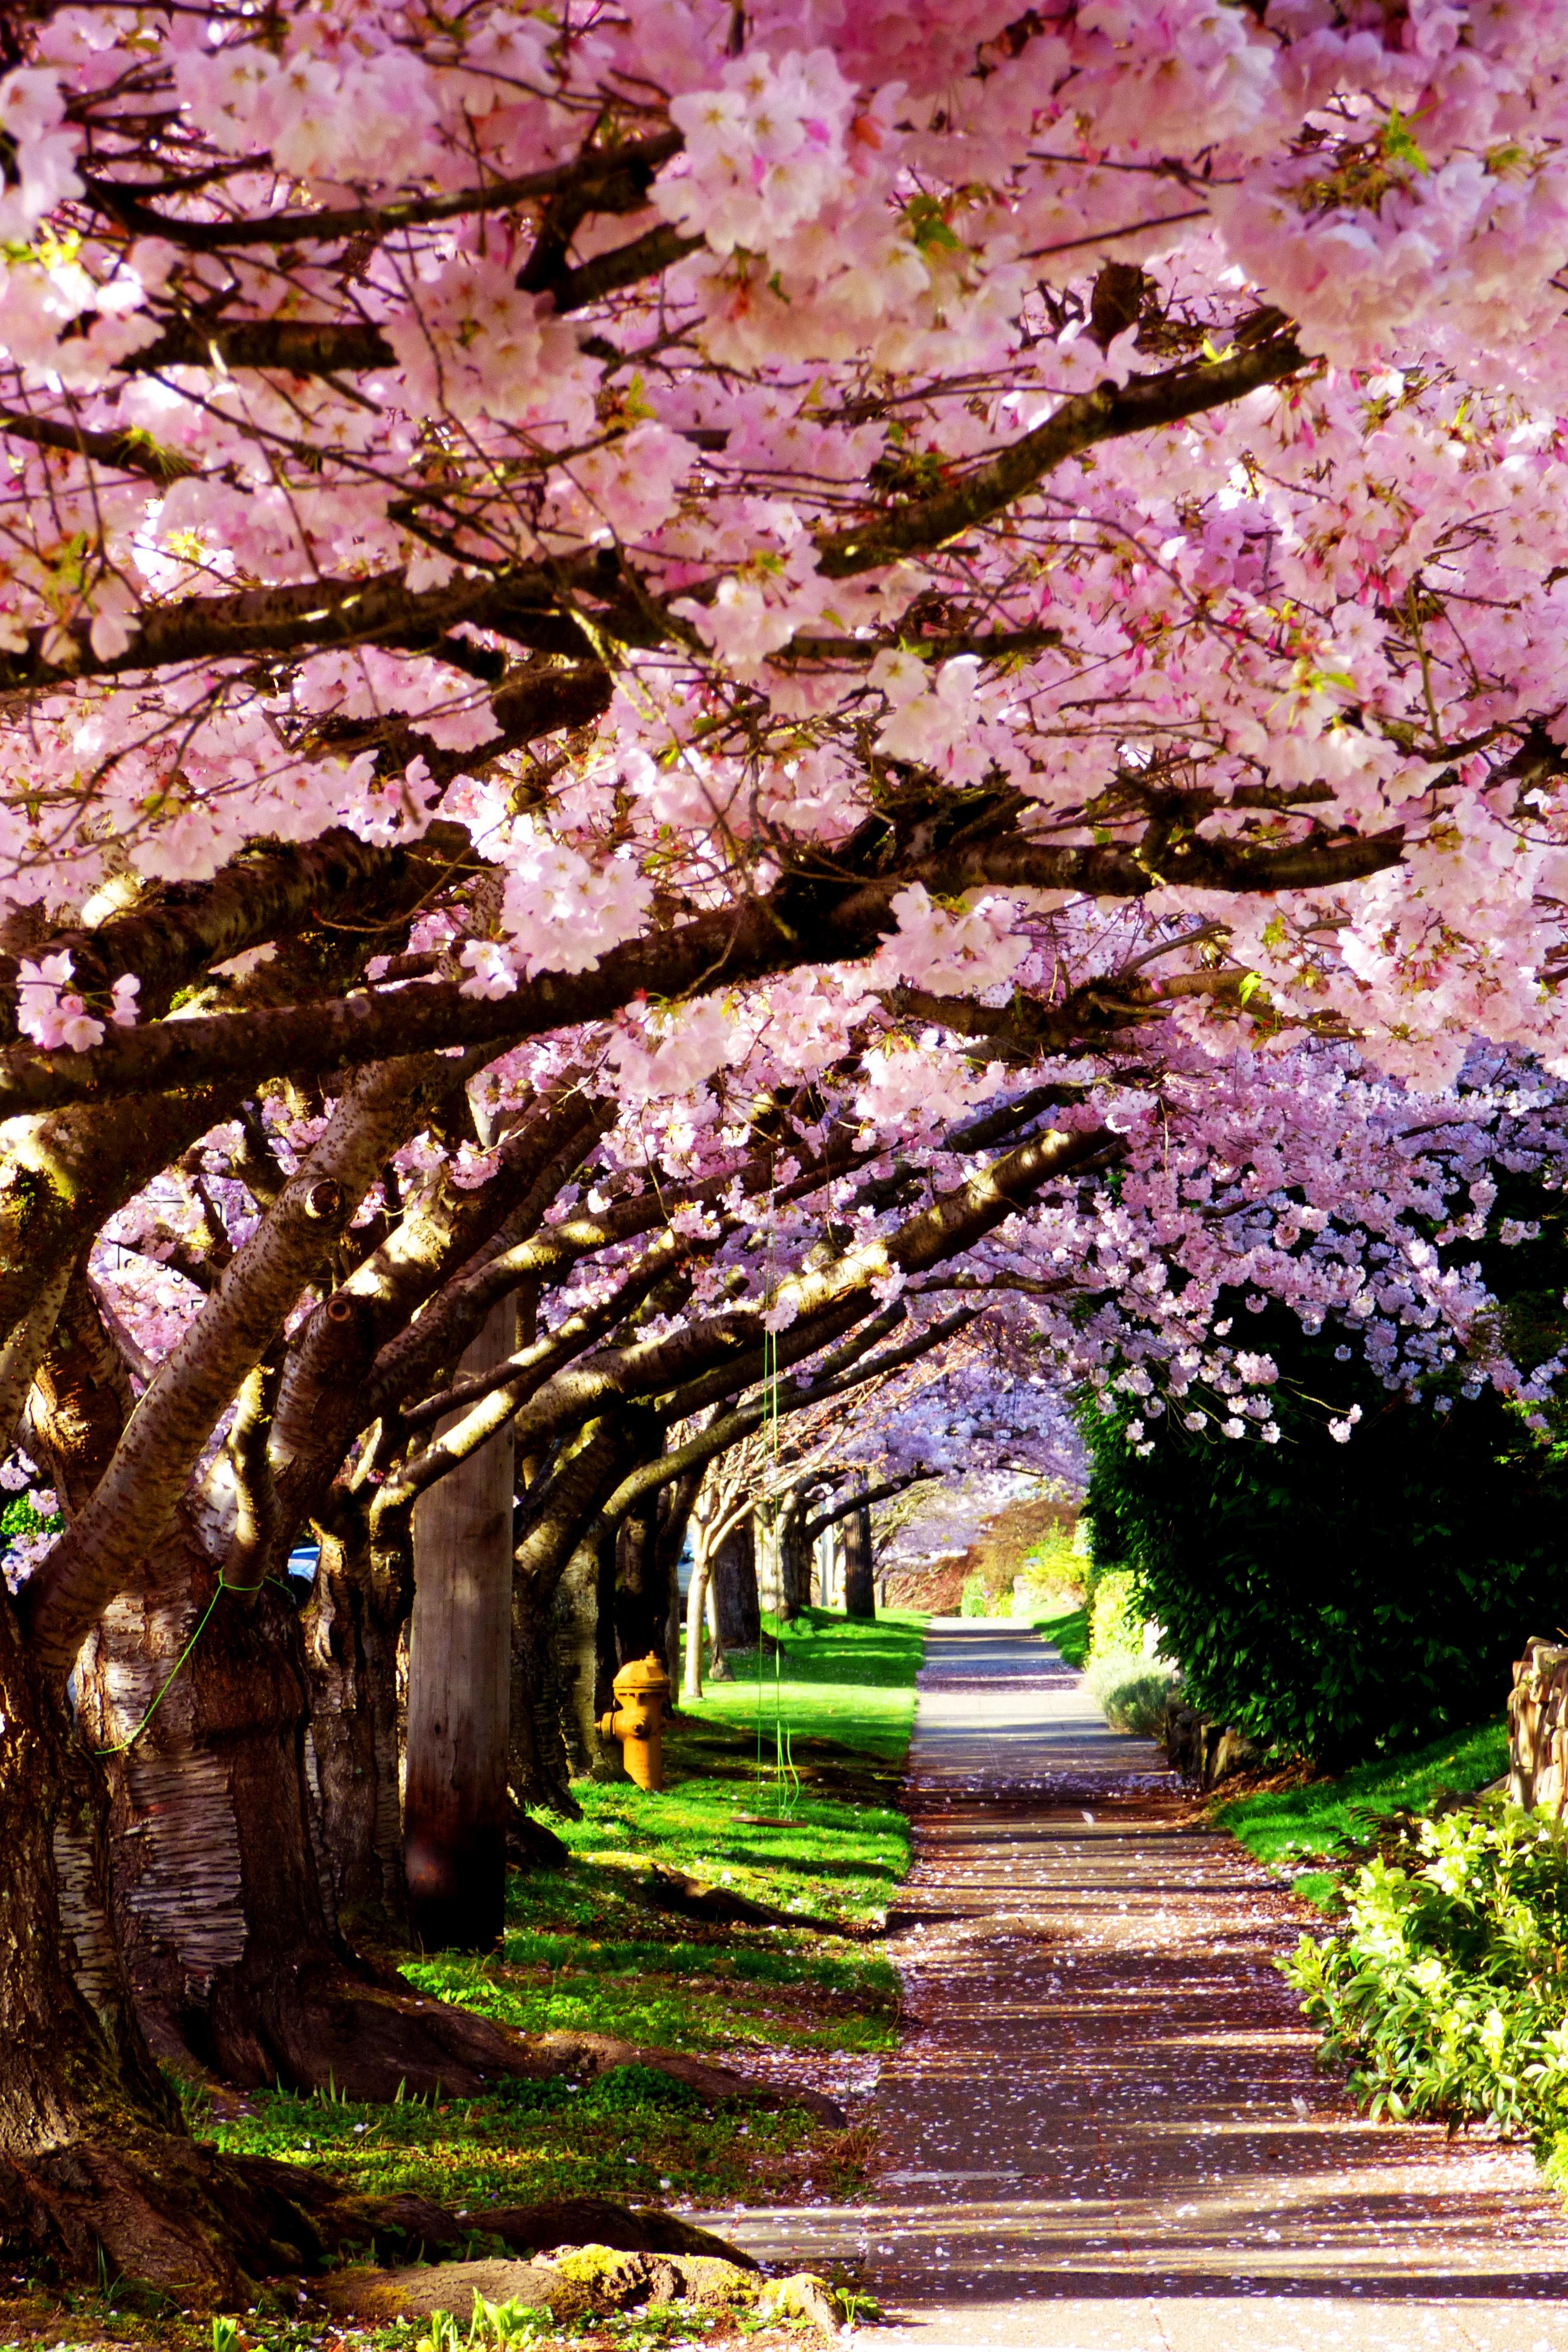 gambar pohon cabang mekar menanam trotoar berkembang kota rh pxhere com